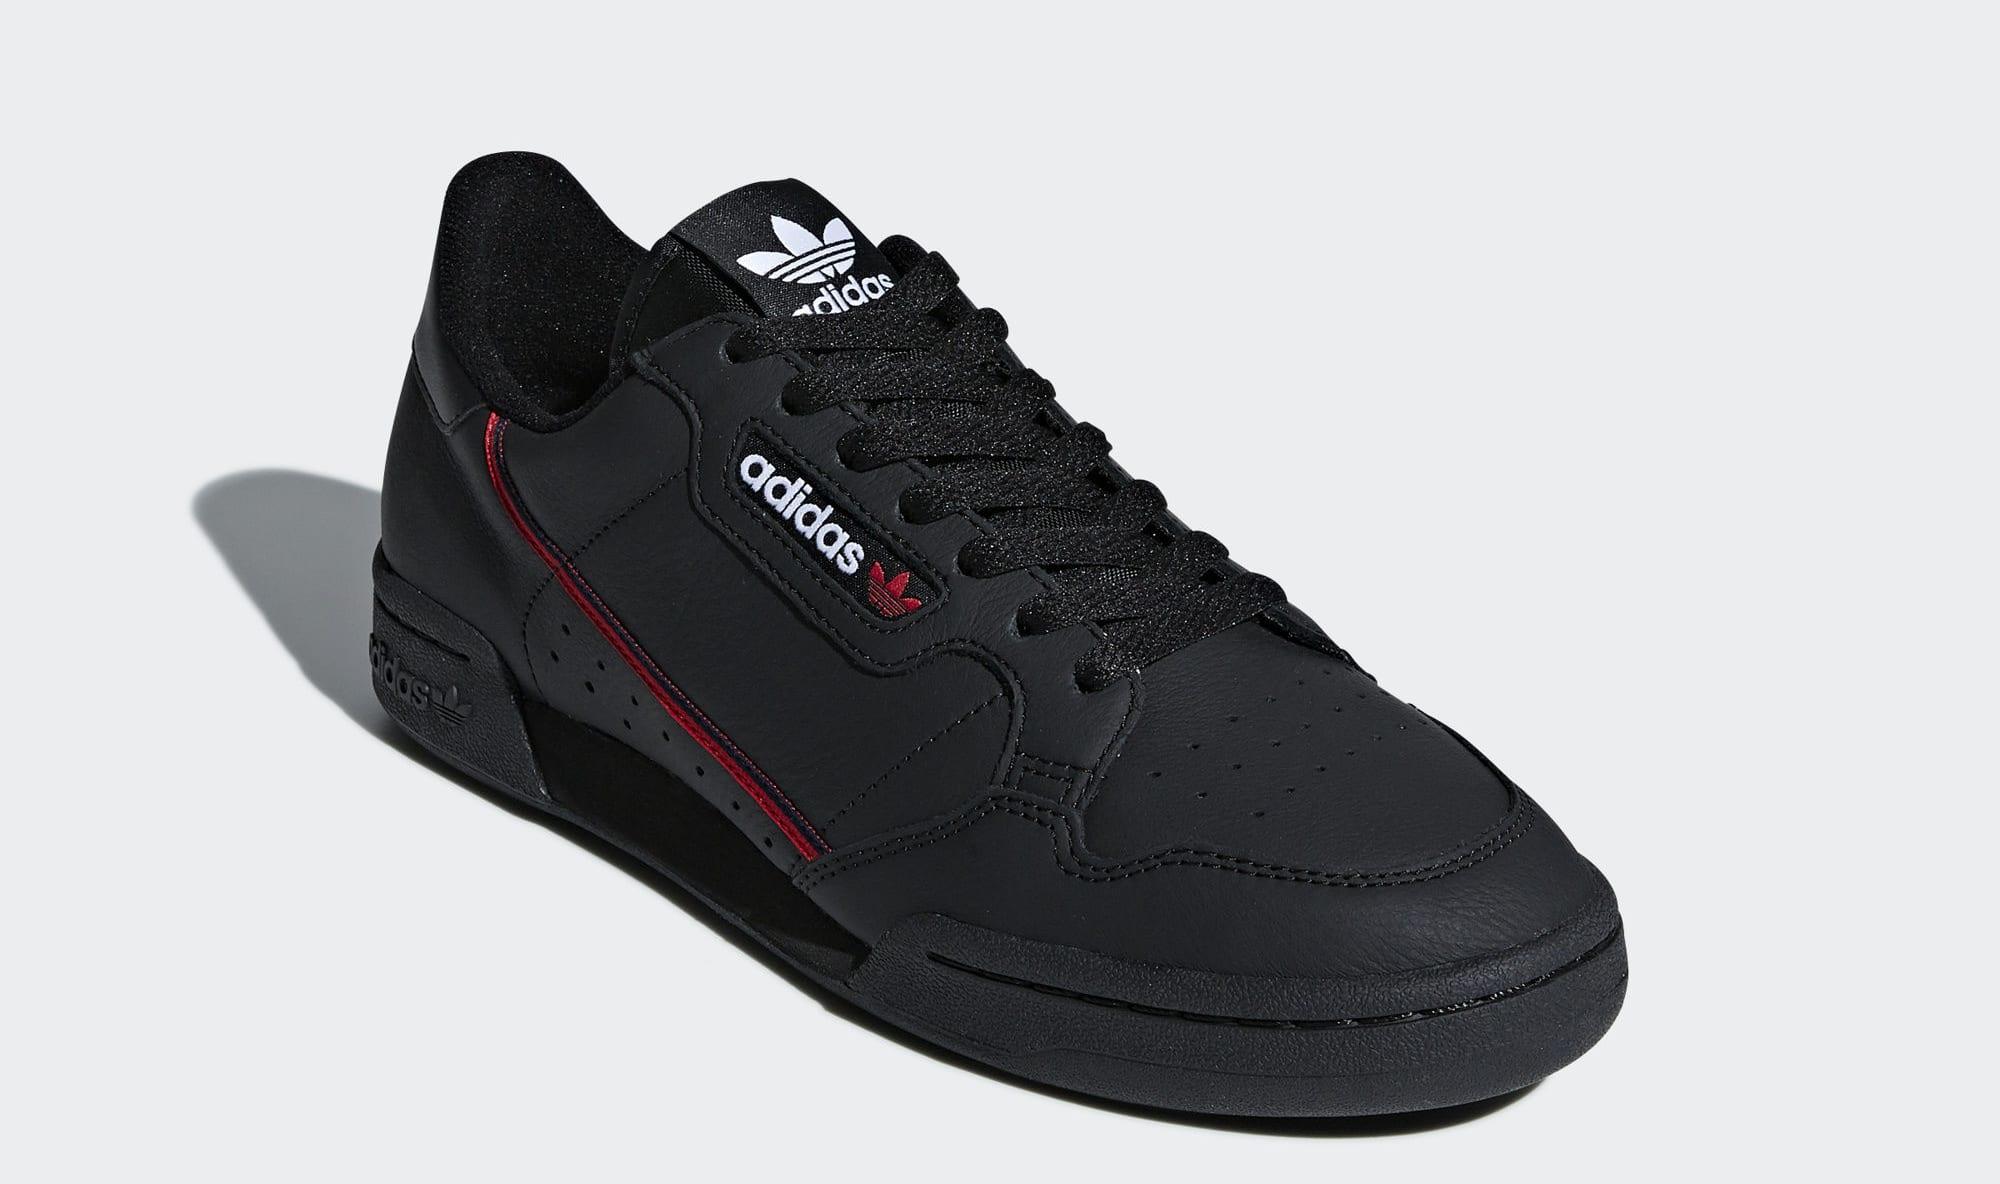 Adidas Continental 80 Rascal 'Black' B41672 (Front)